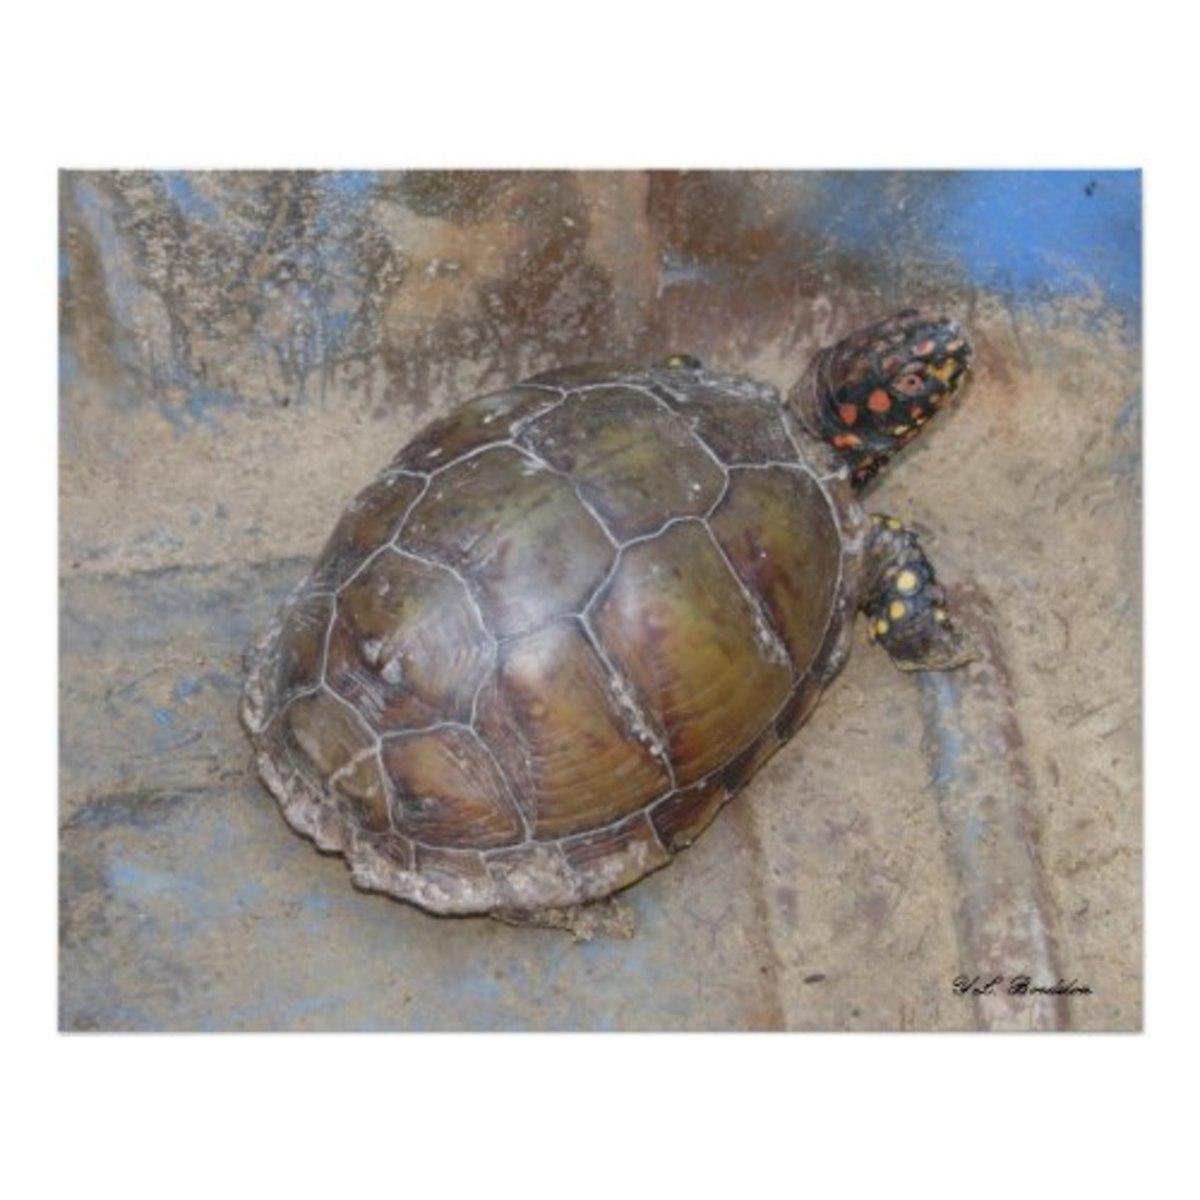 box-turtles-louisiana